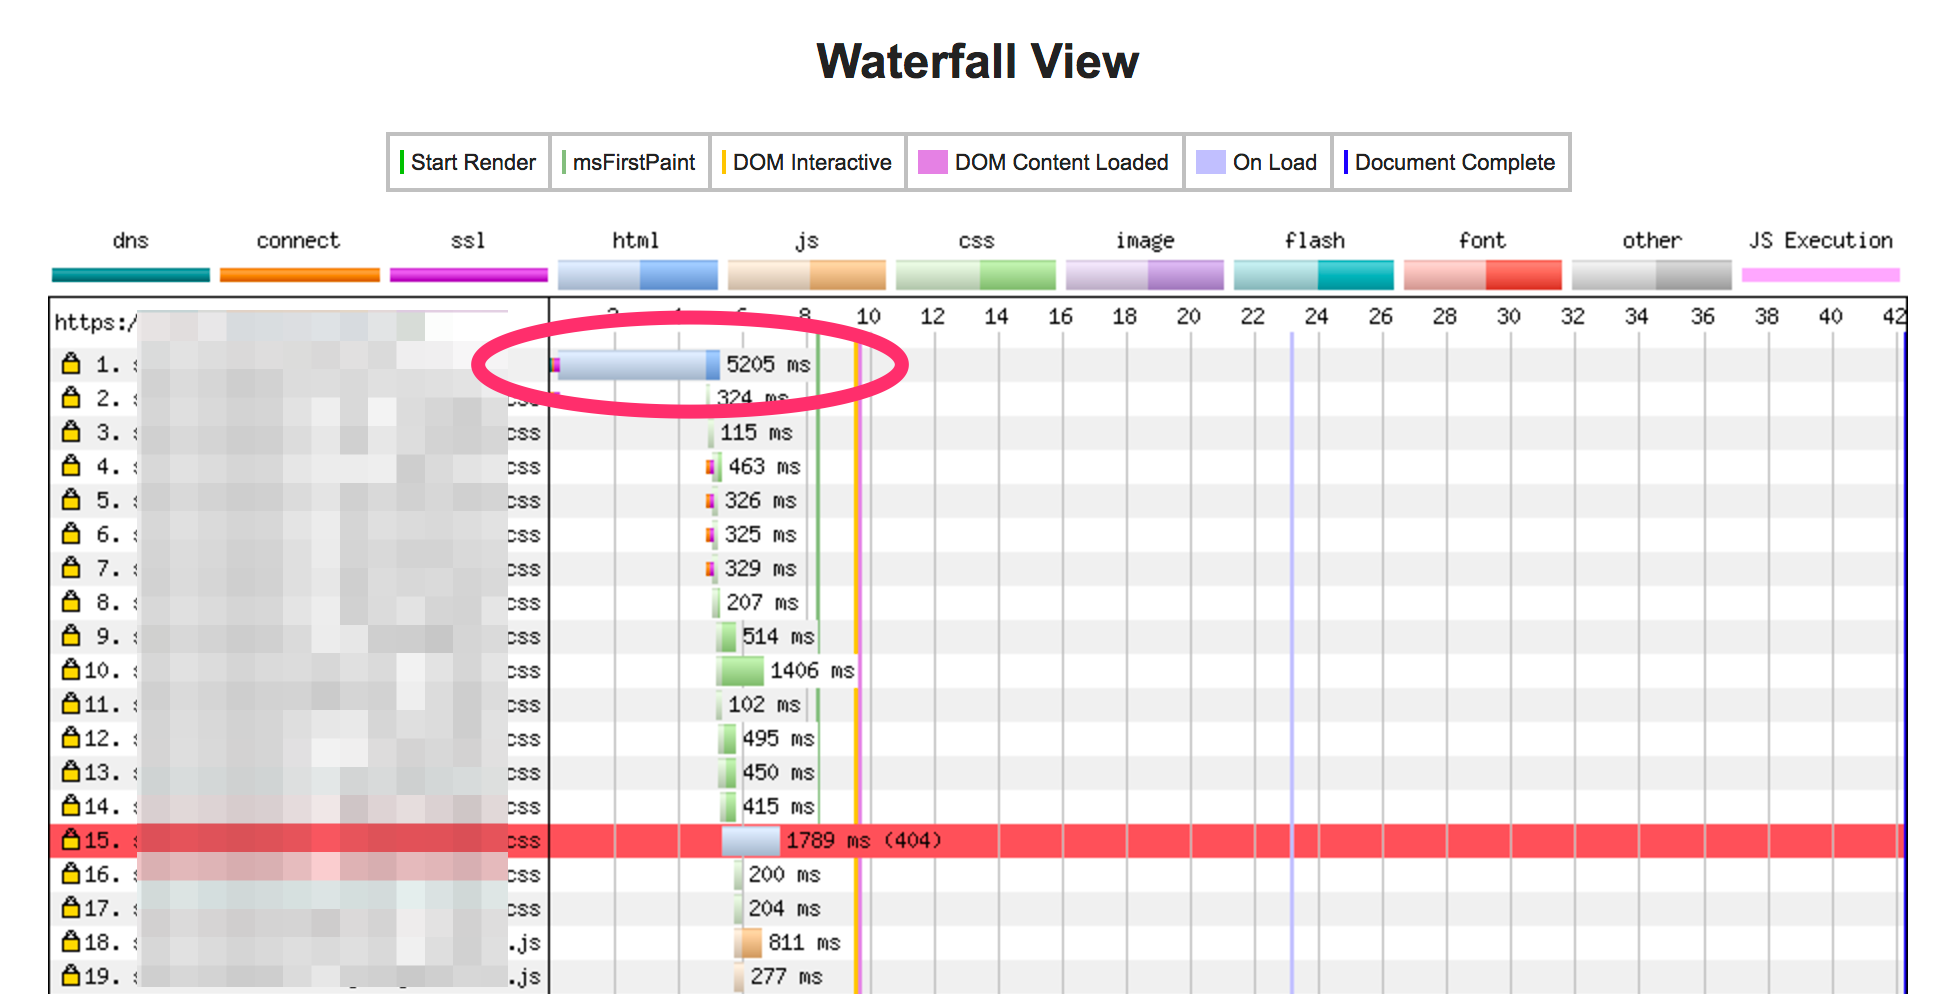 TTFB waterfall chart